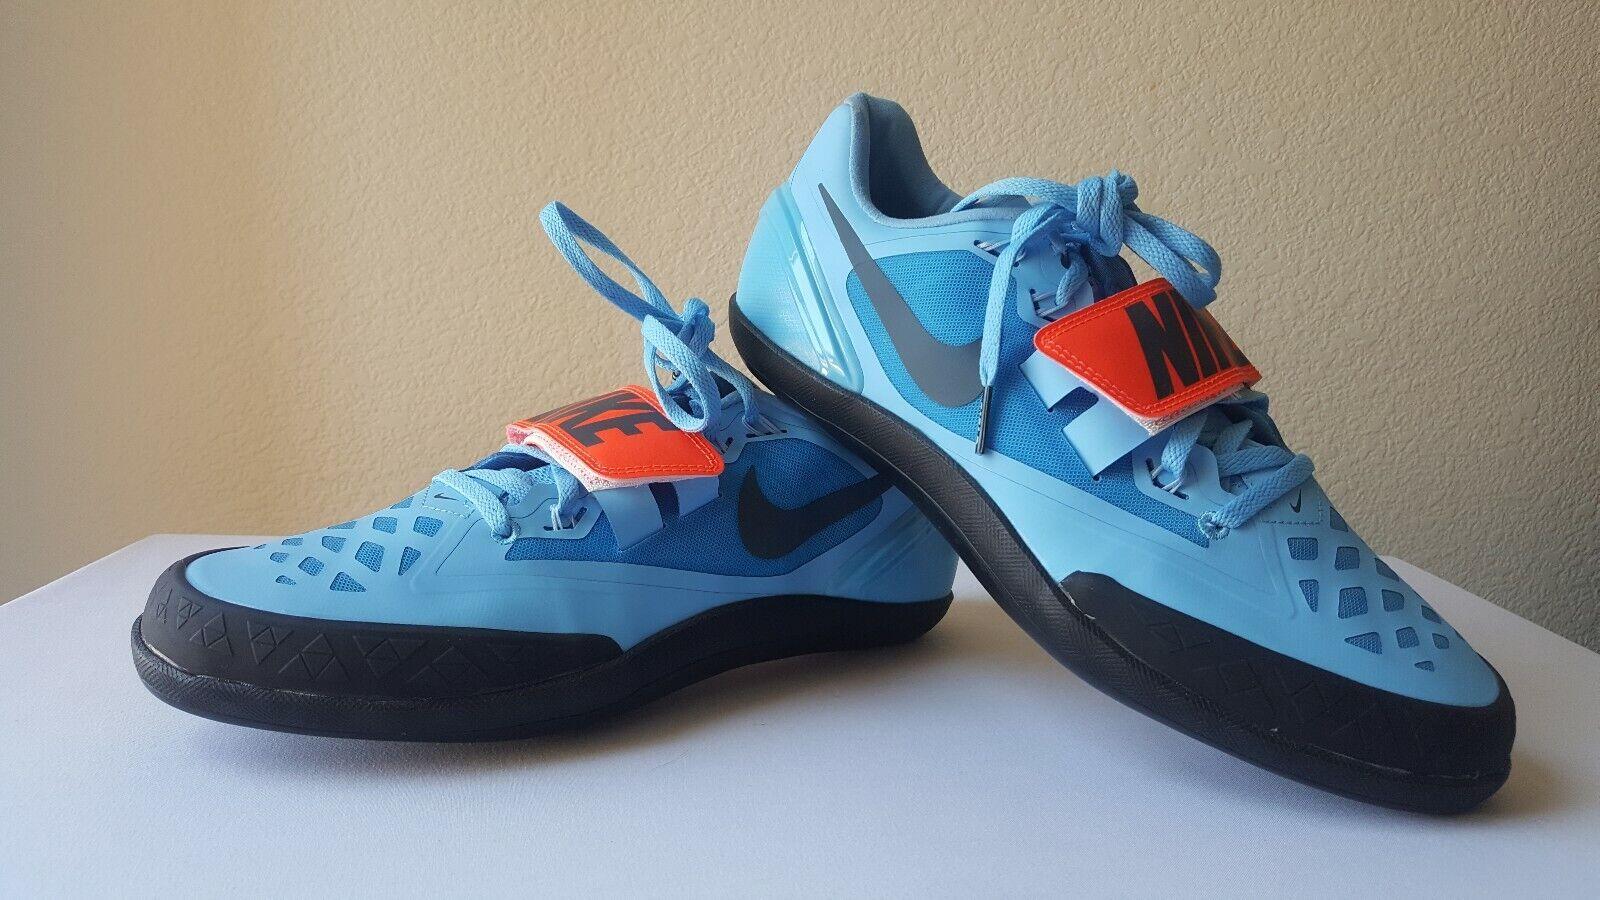 Nike Zoom redational 6 Throwing Shot Put Discus shoes 685131-446 Men's Size 9.5